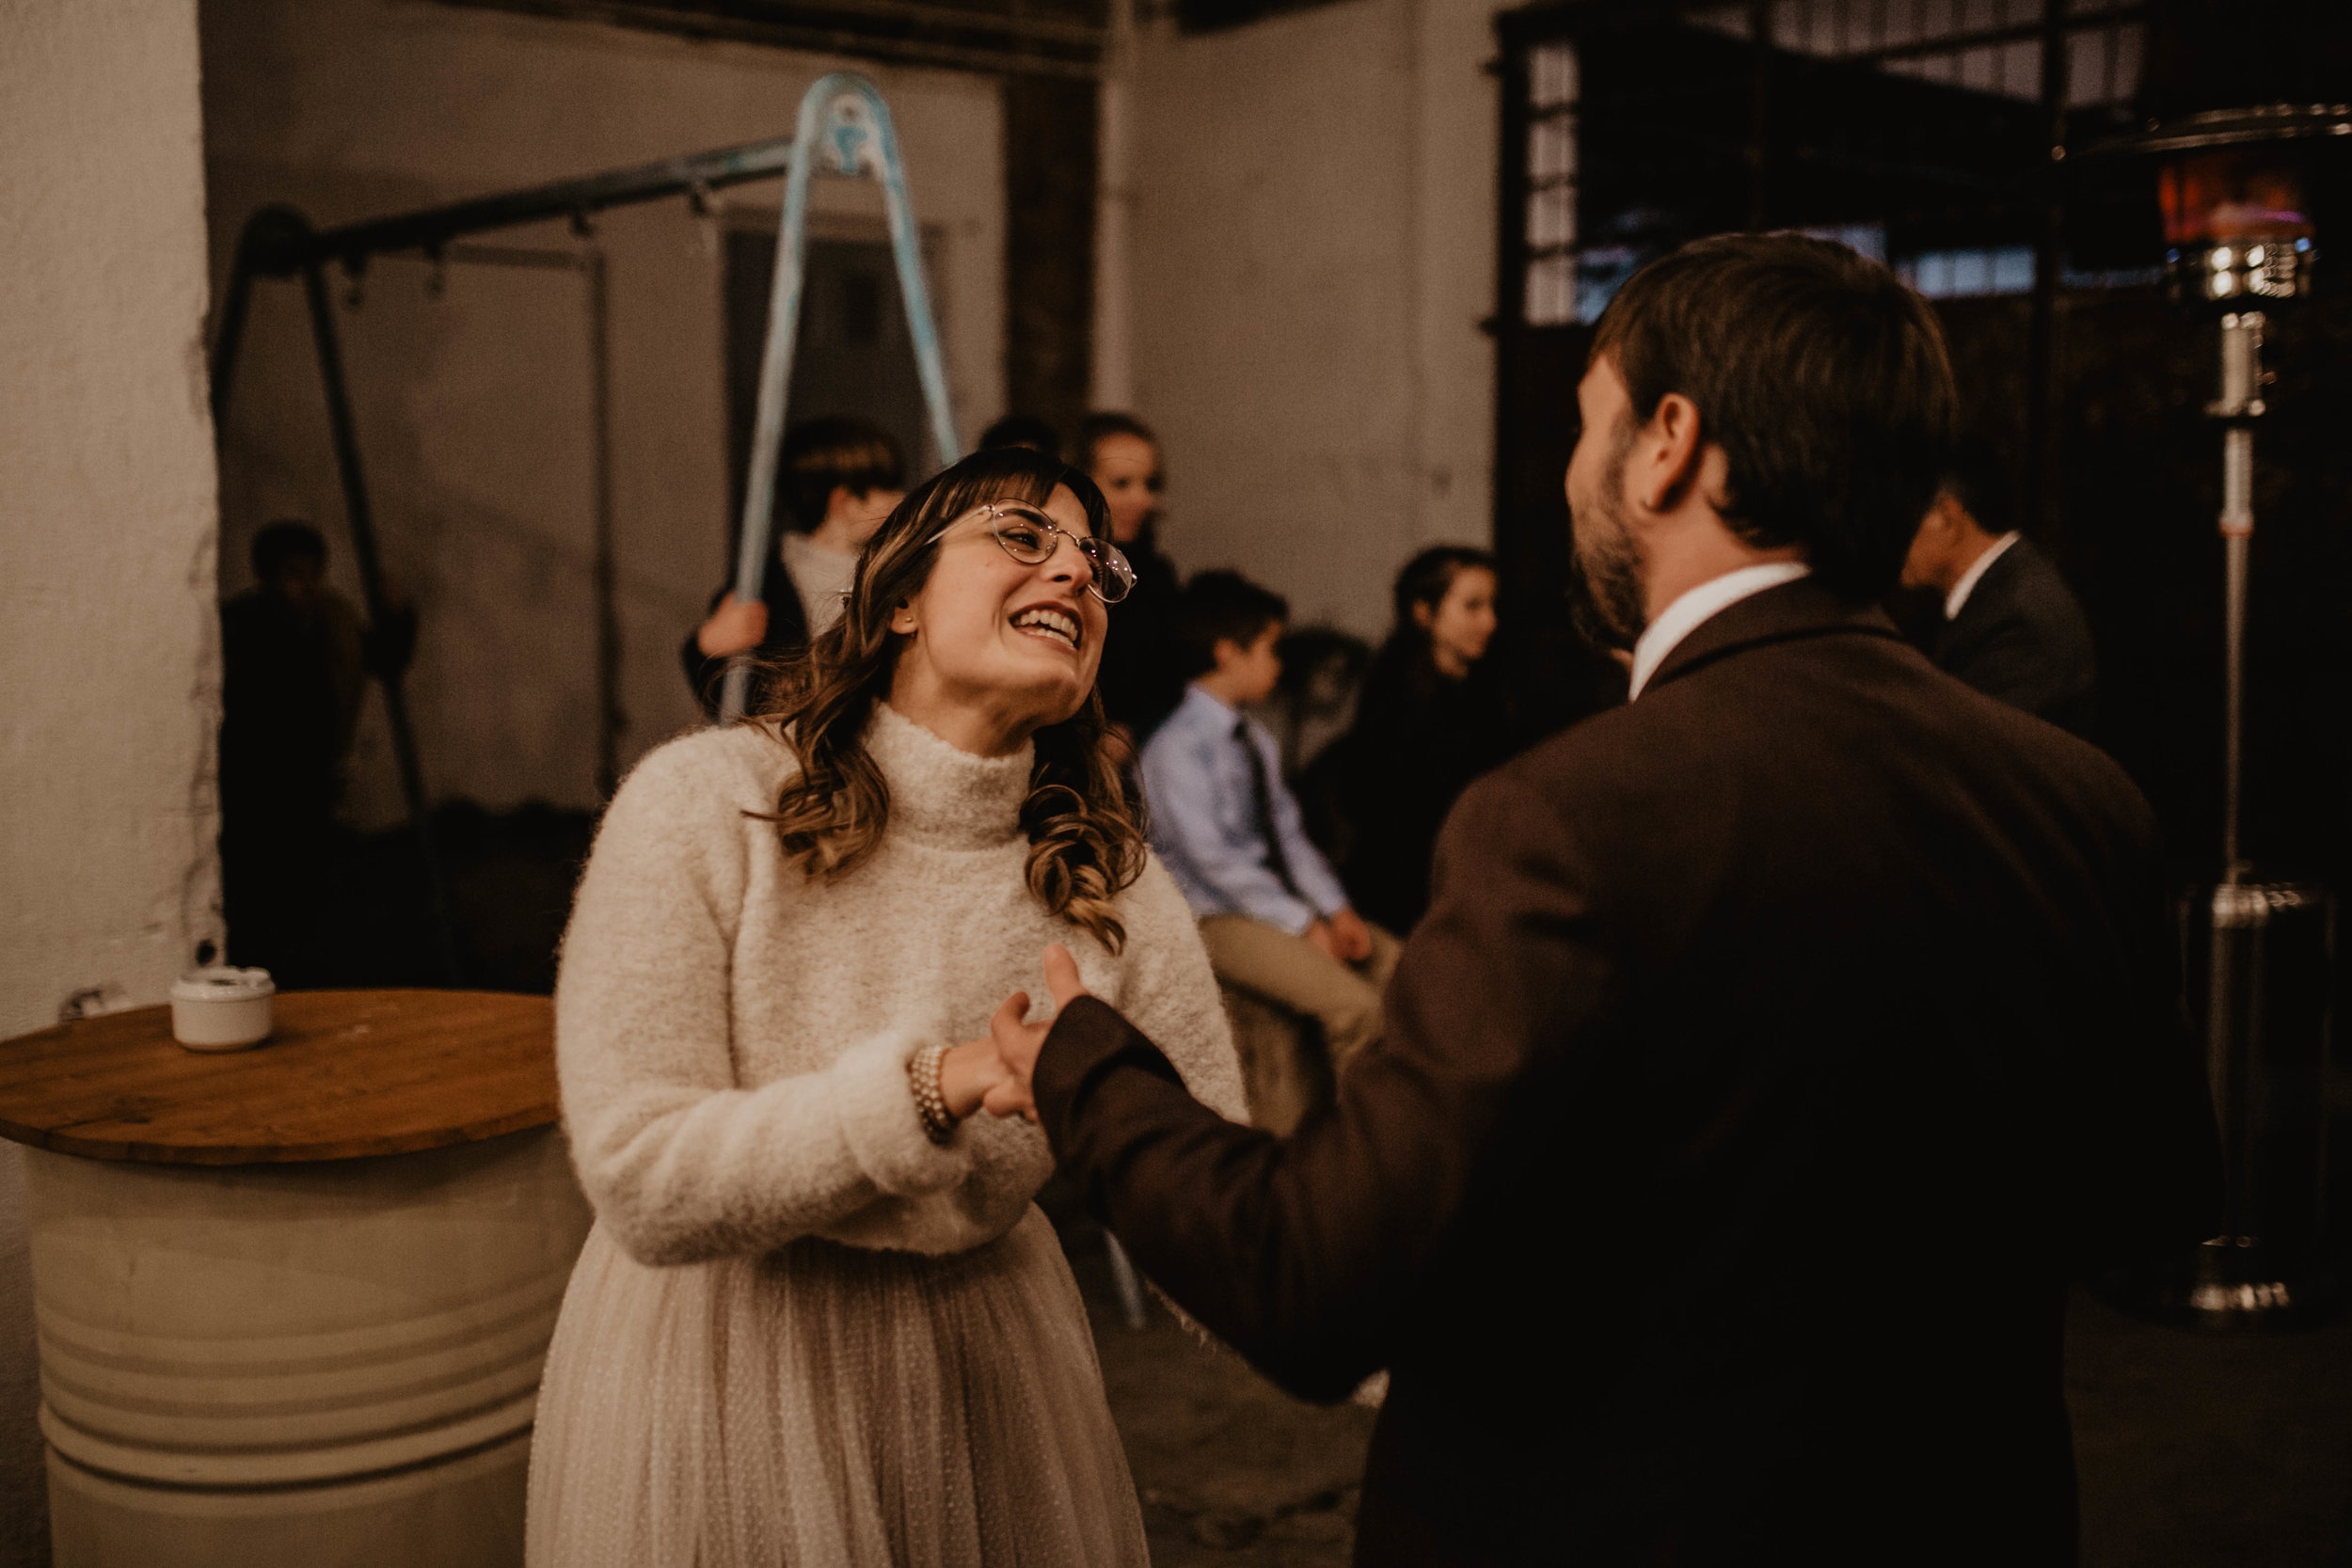 thenortherngirlphotography-photography-weddingphotography-couple-bodasconestilo-bodasenbarcelona-martadavid-1086.jpg